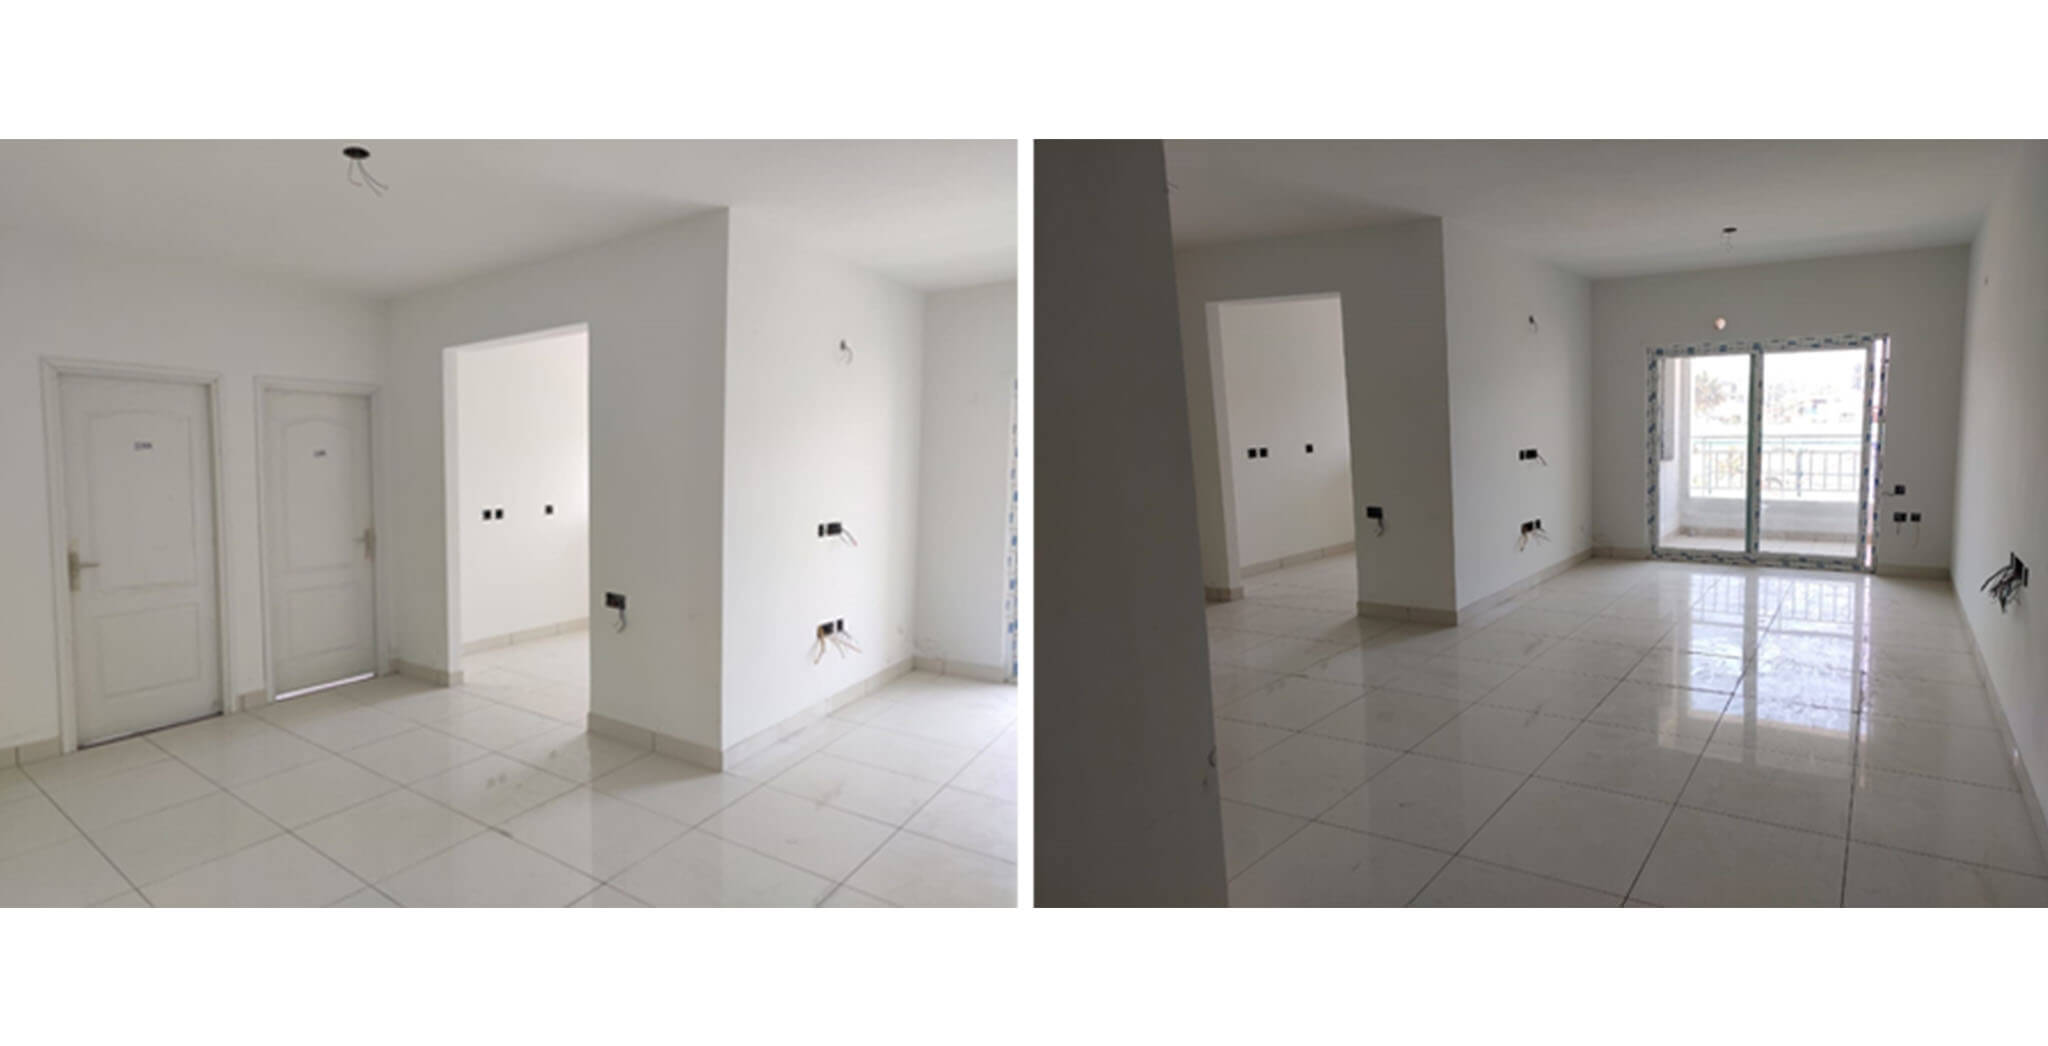 May 2021 - Ready for QA inspection (internal flats)